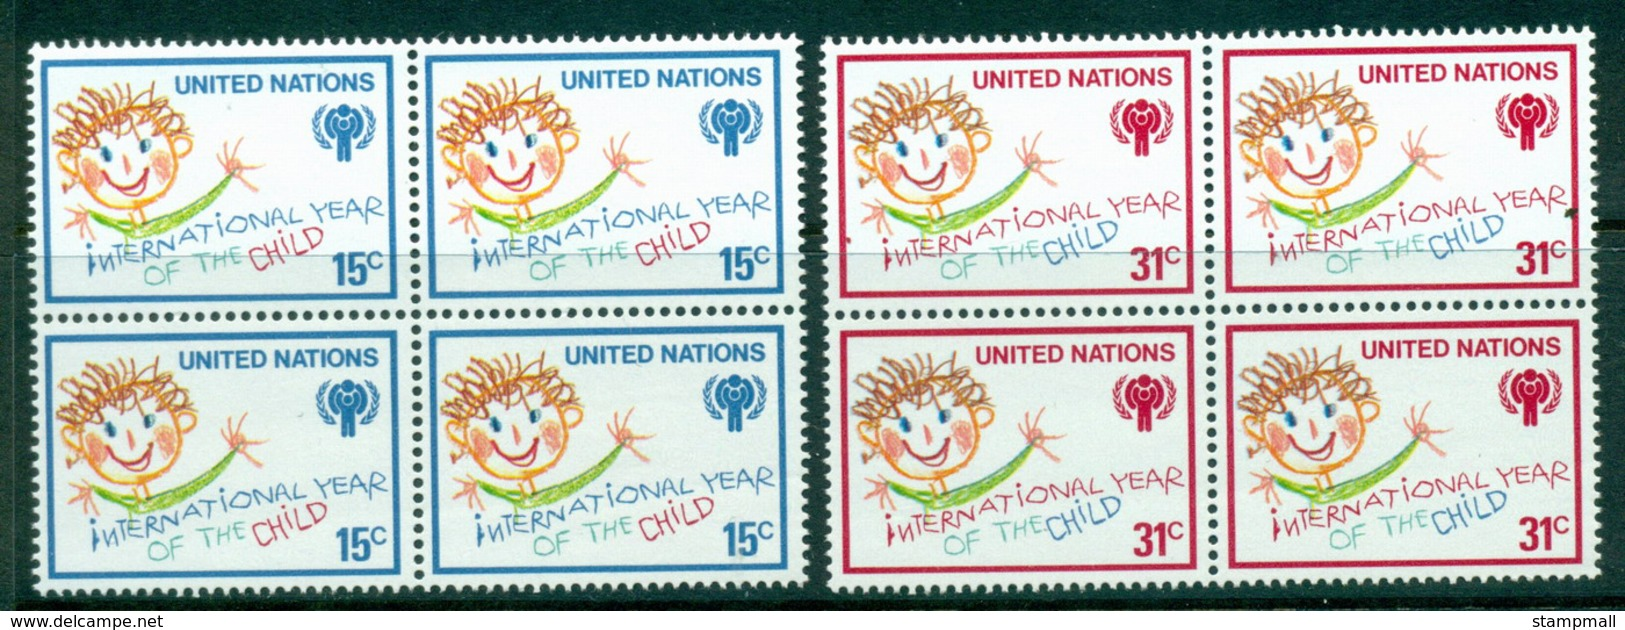 UN New York 1979 IYC Intl. Year Of The Child Blk 4 MUH Lot41024 - New York -  VN Hauptquartier